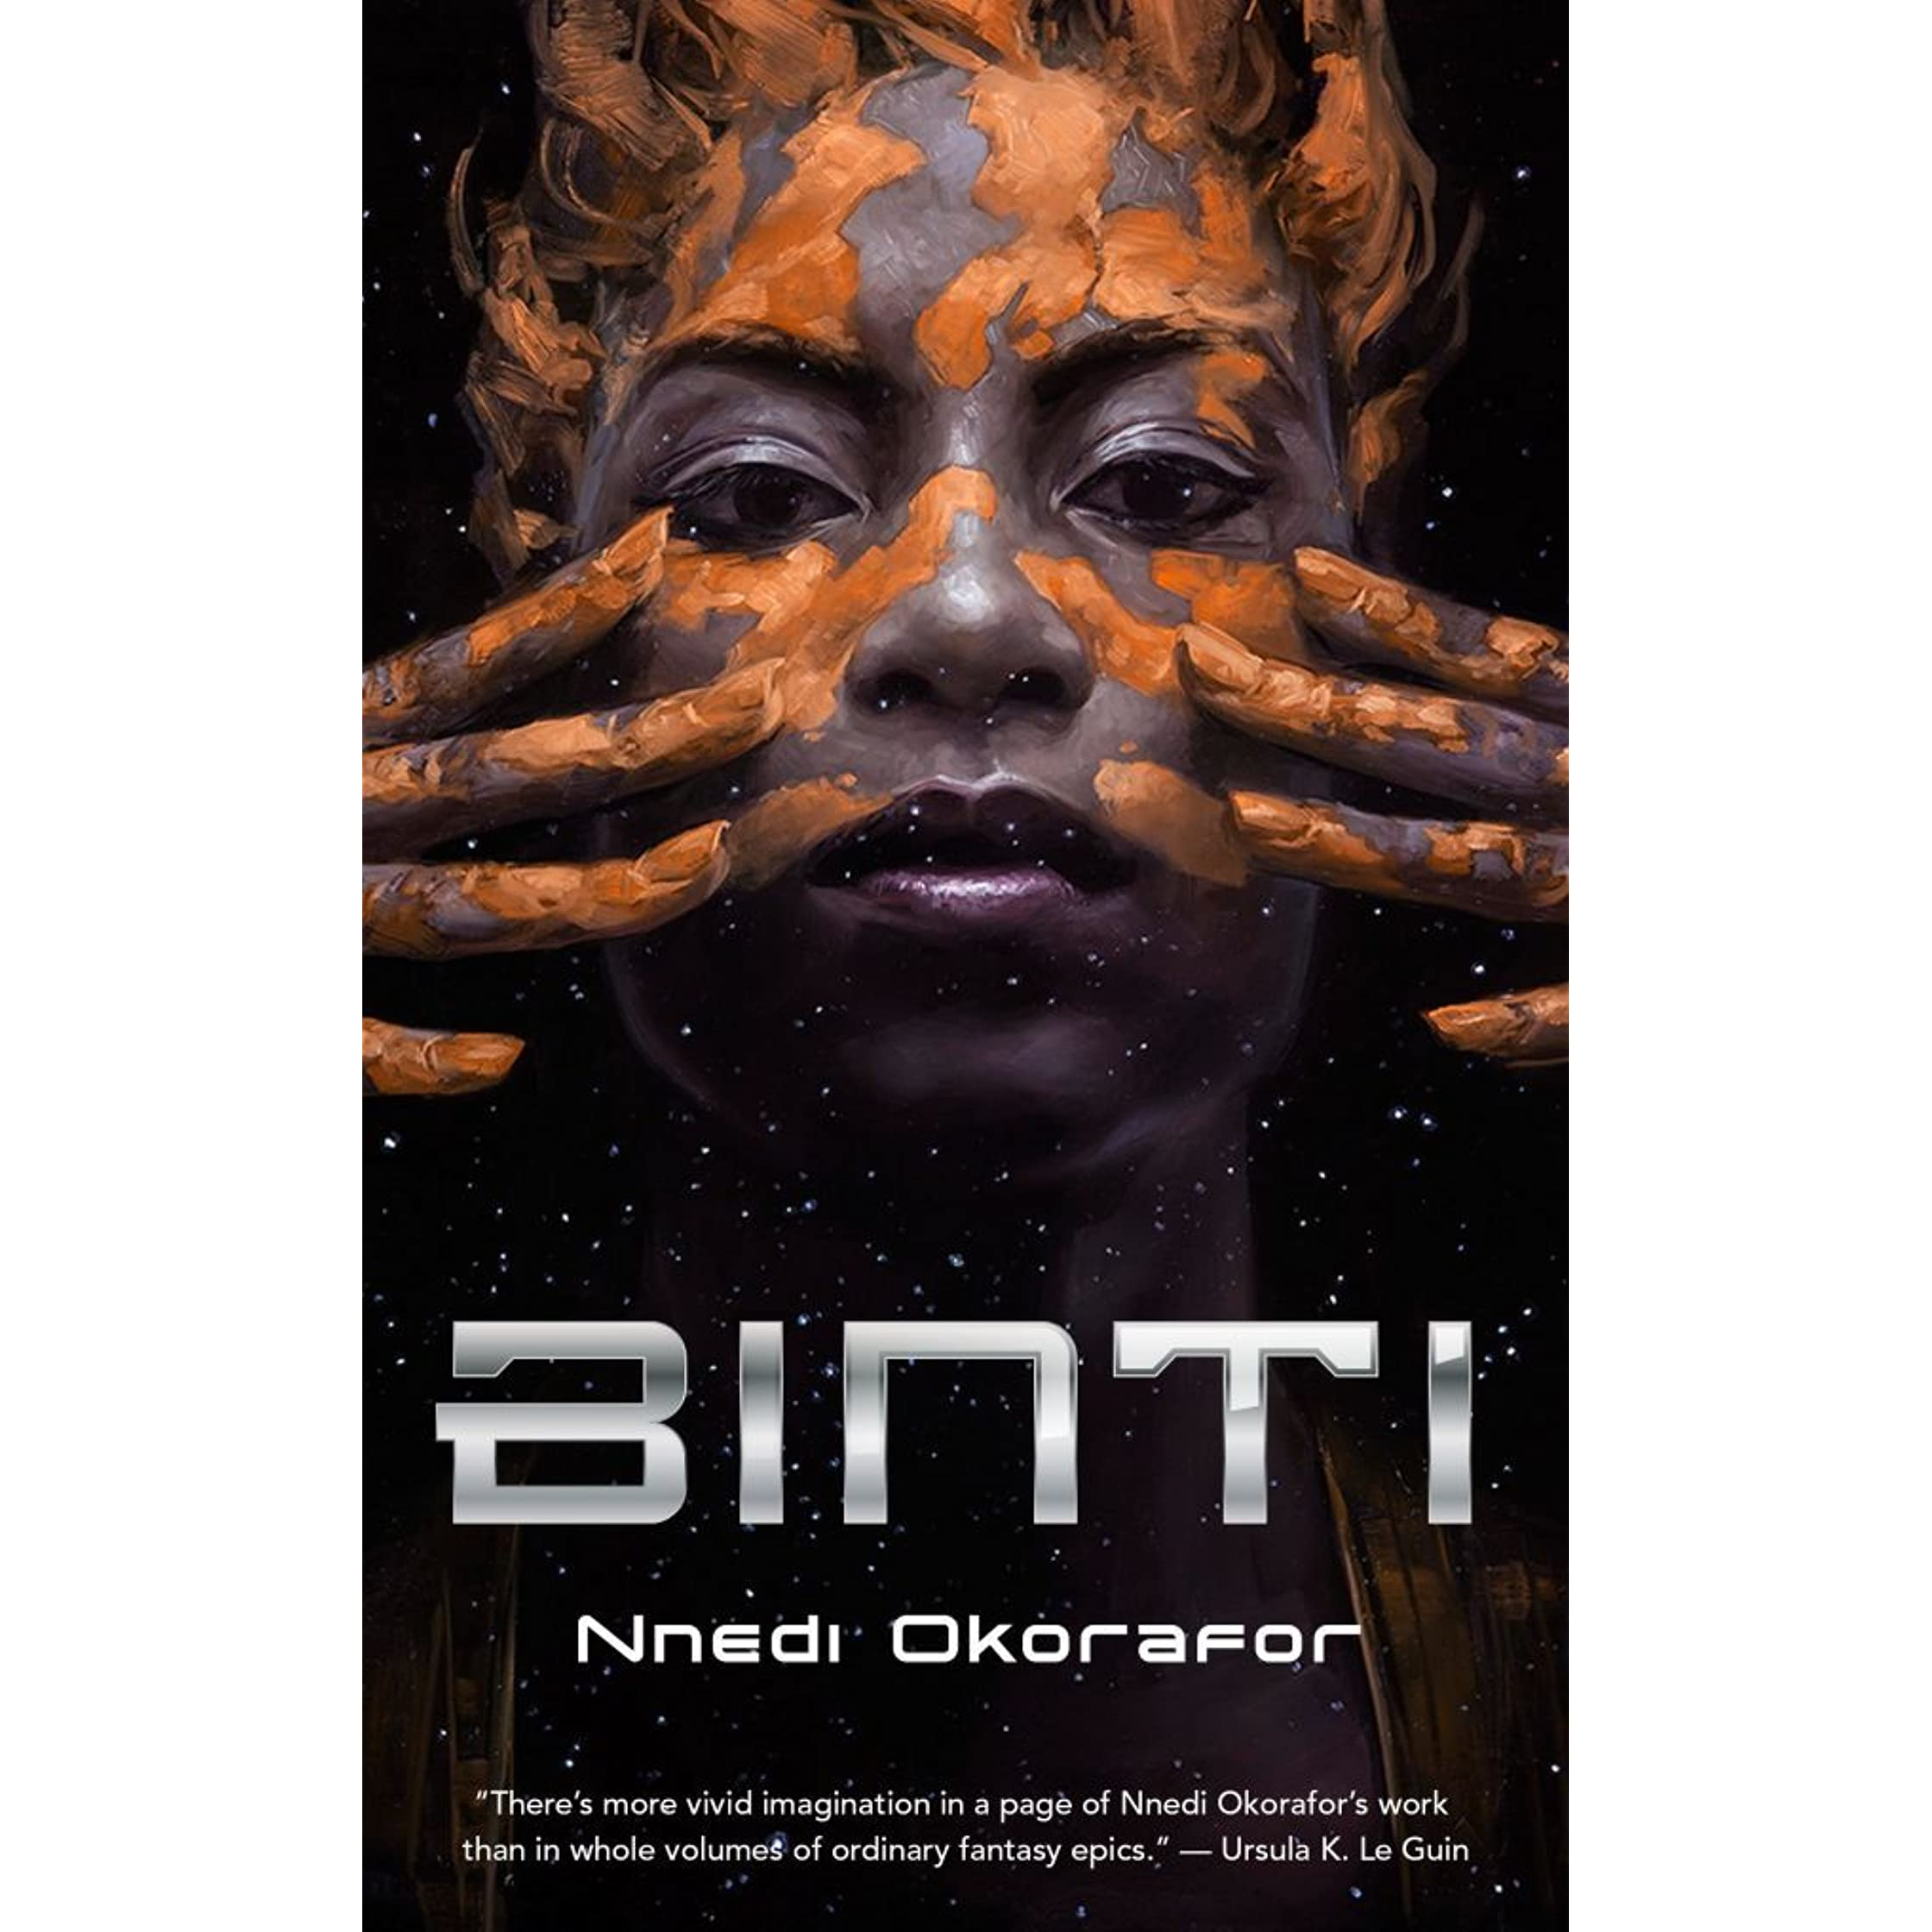 Binti (Binti, #1) by Nnedi Okorafor